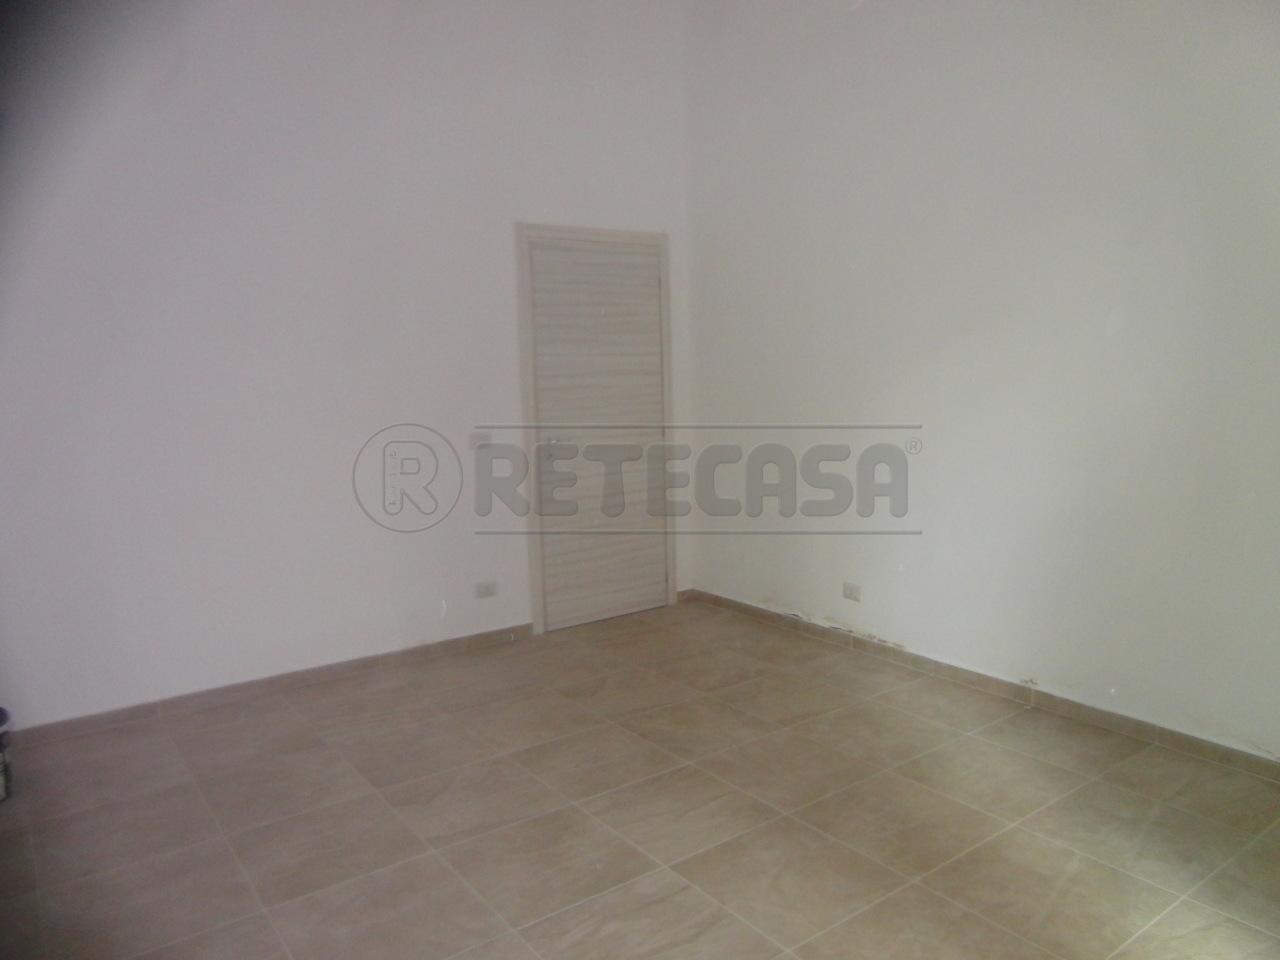 Rustico / Casale in Affitto a Siracusa